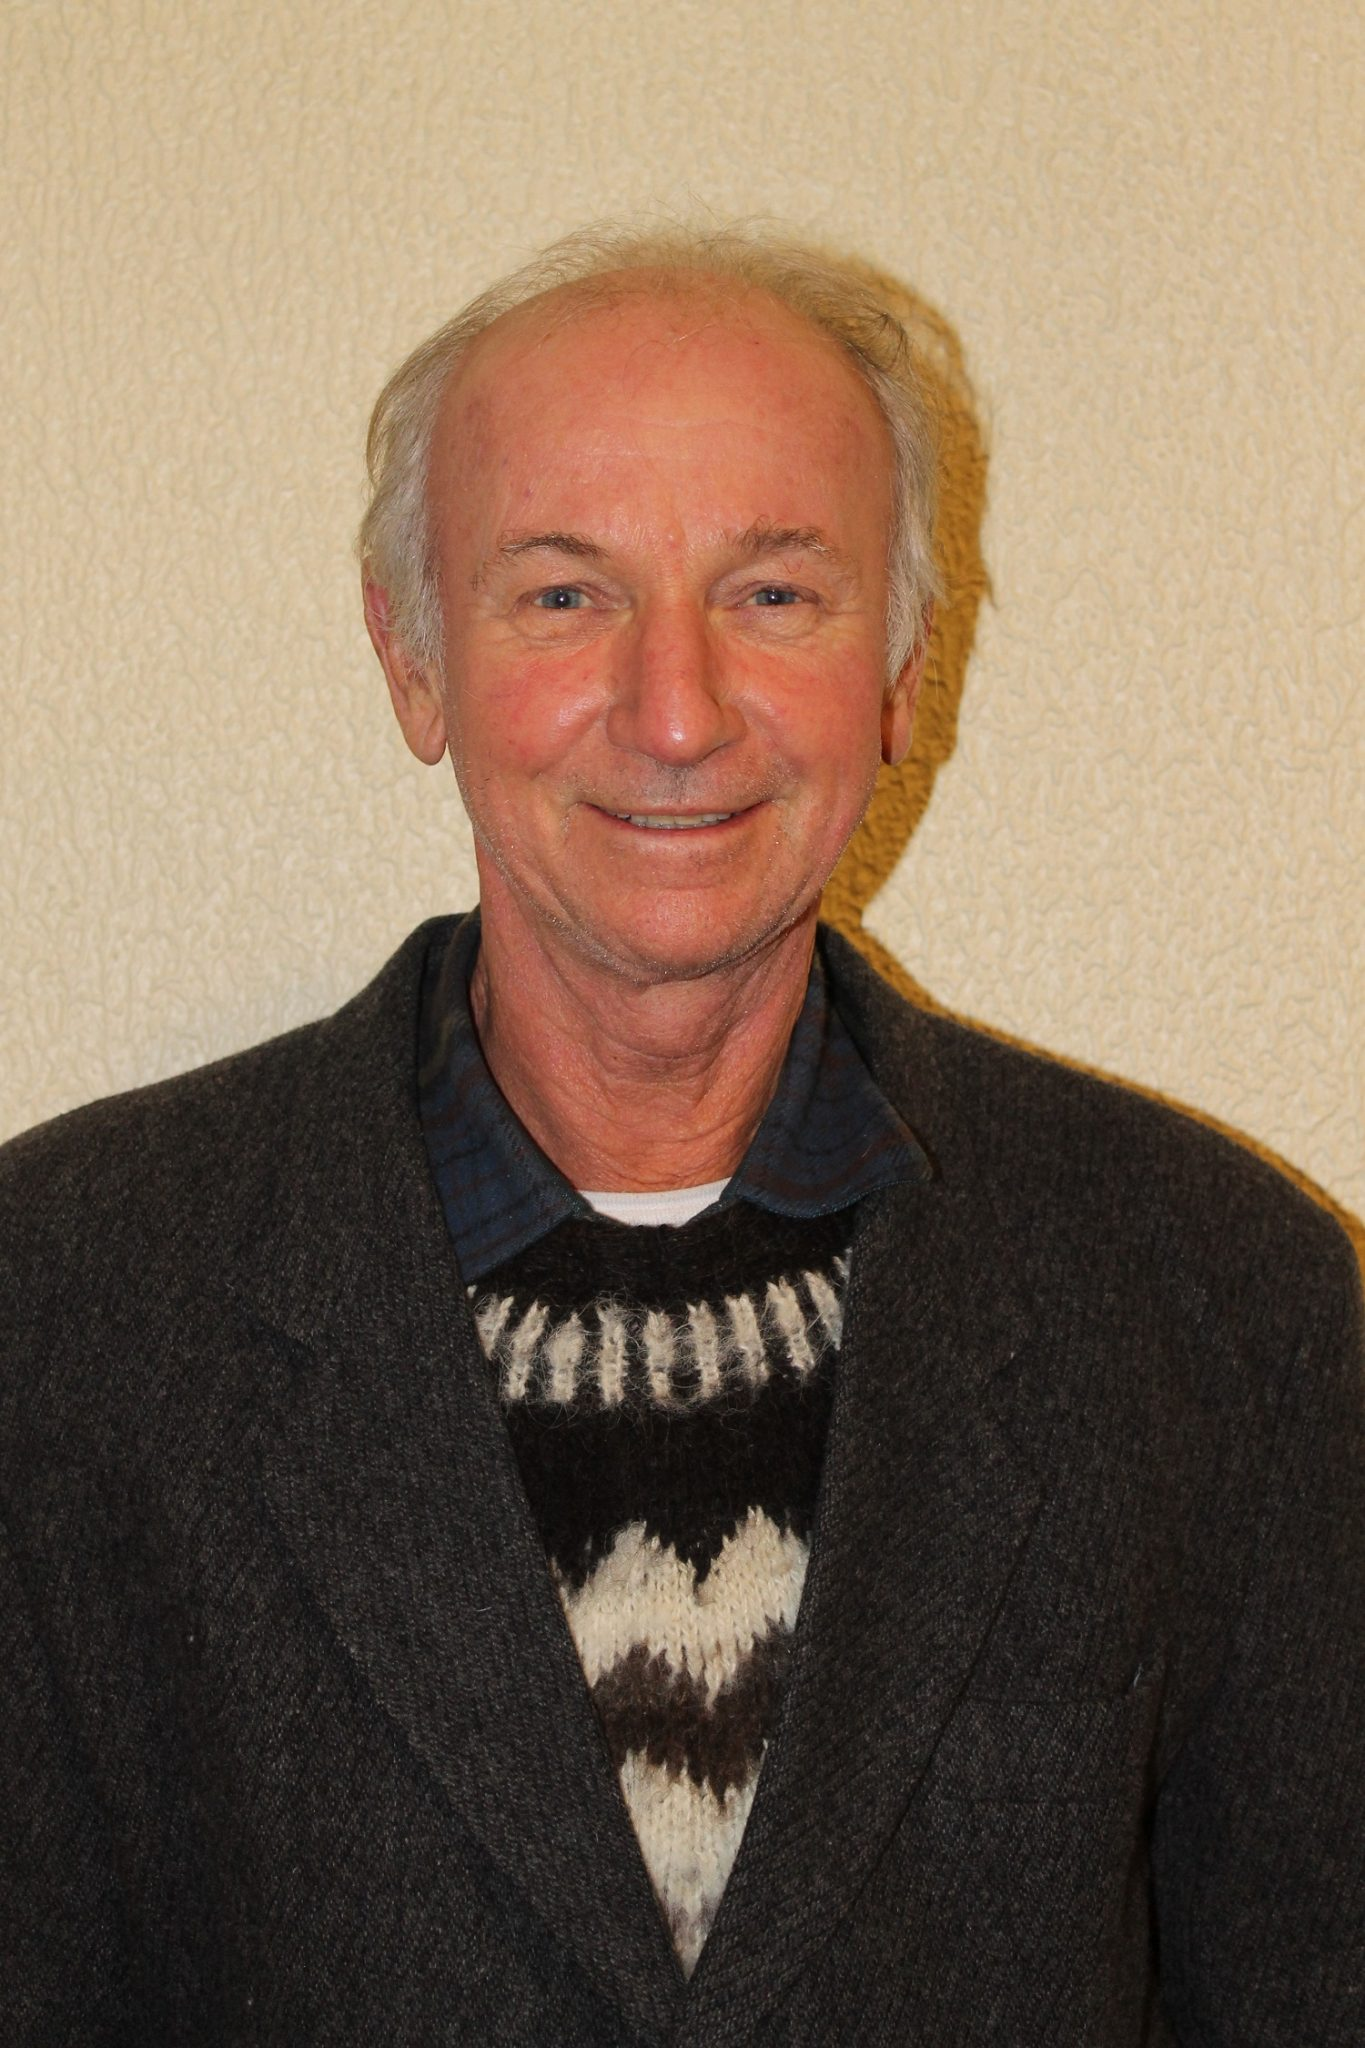 Carlos Humberto Goidanich